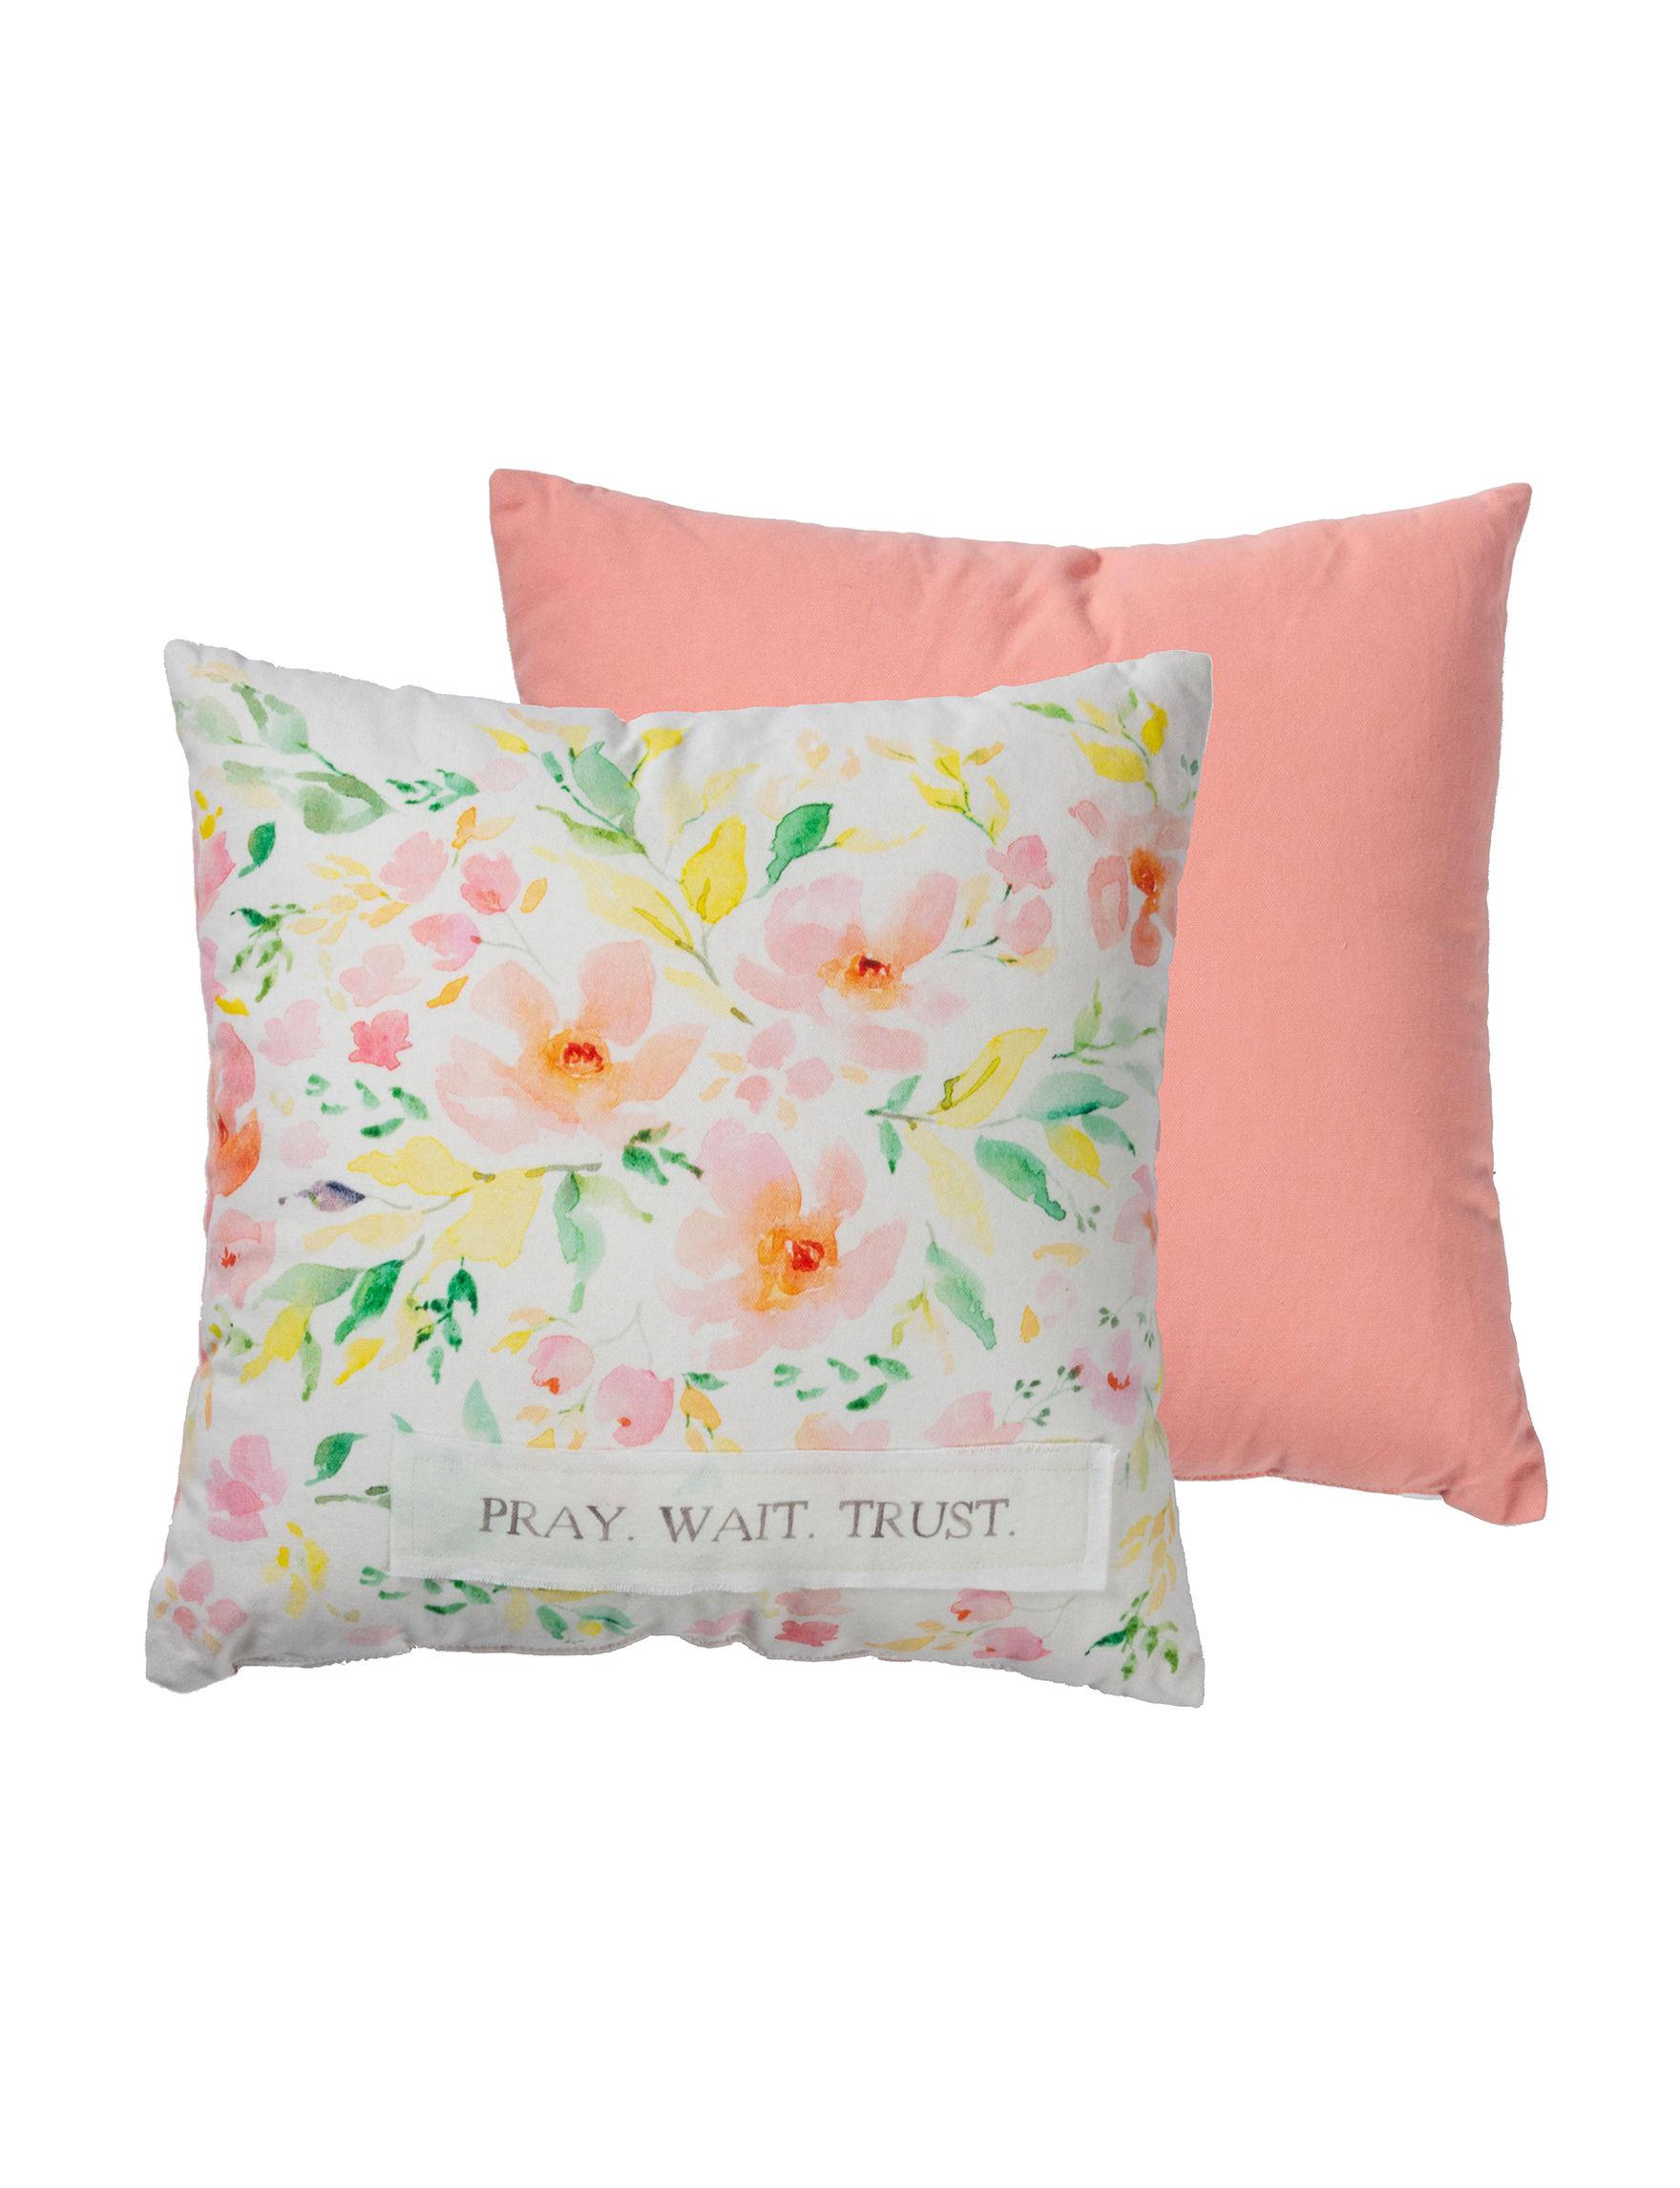 Primitives by Kathy White Multi Decorative Pillows